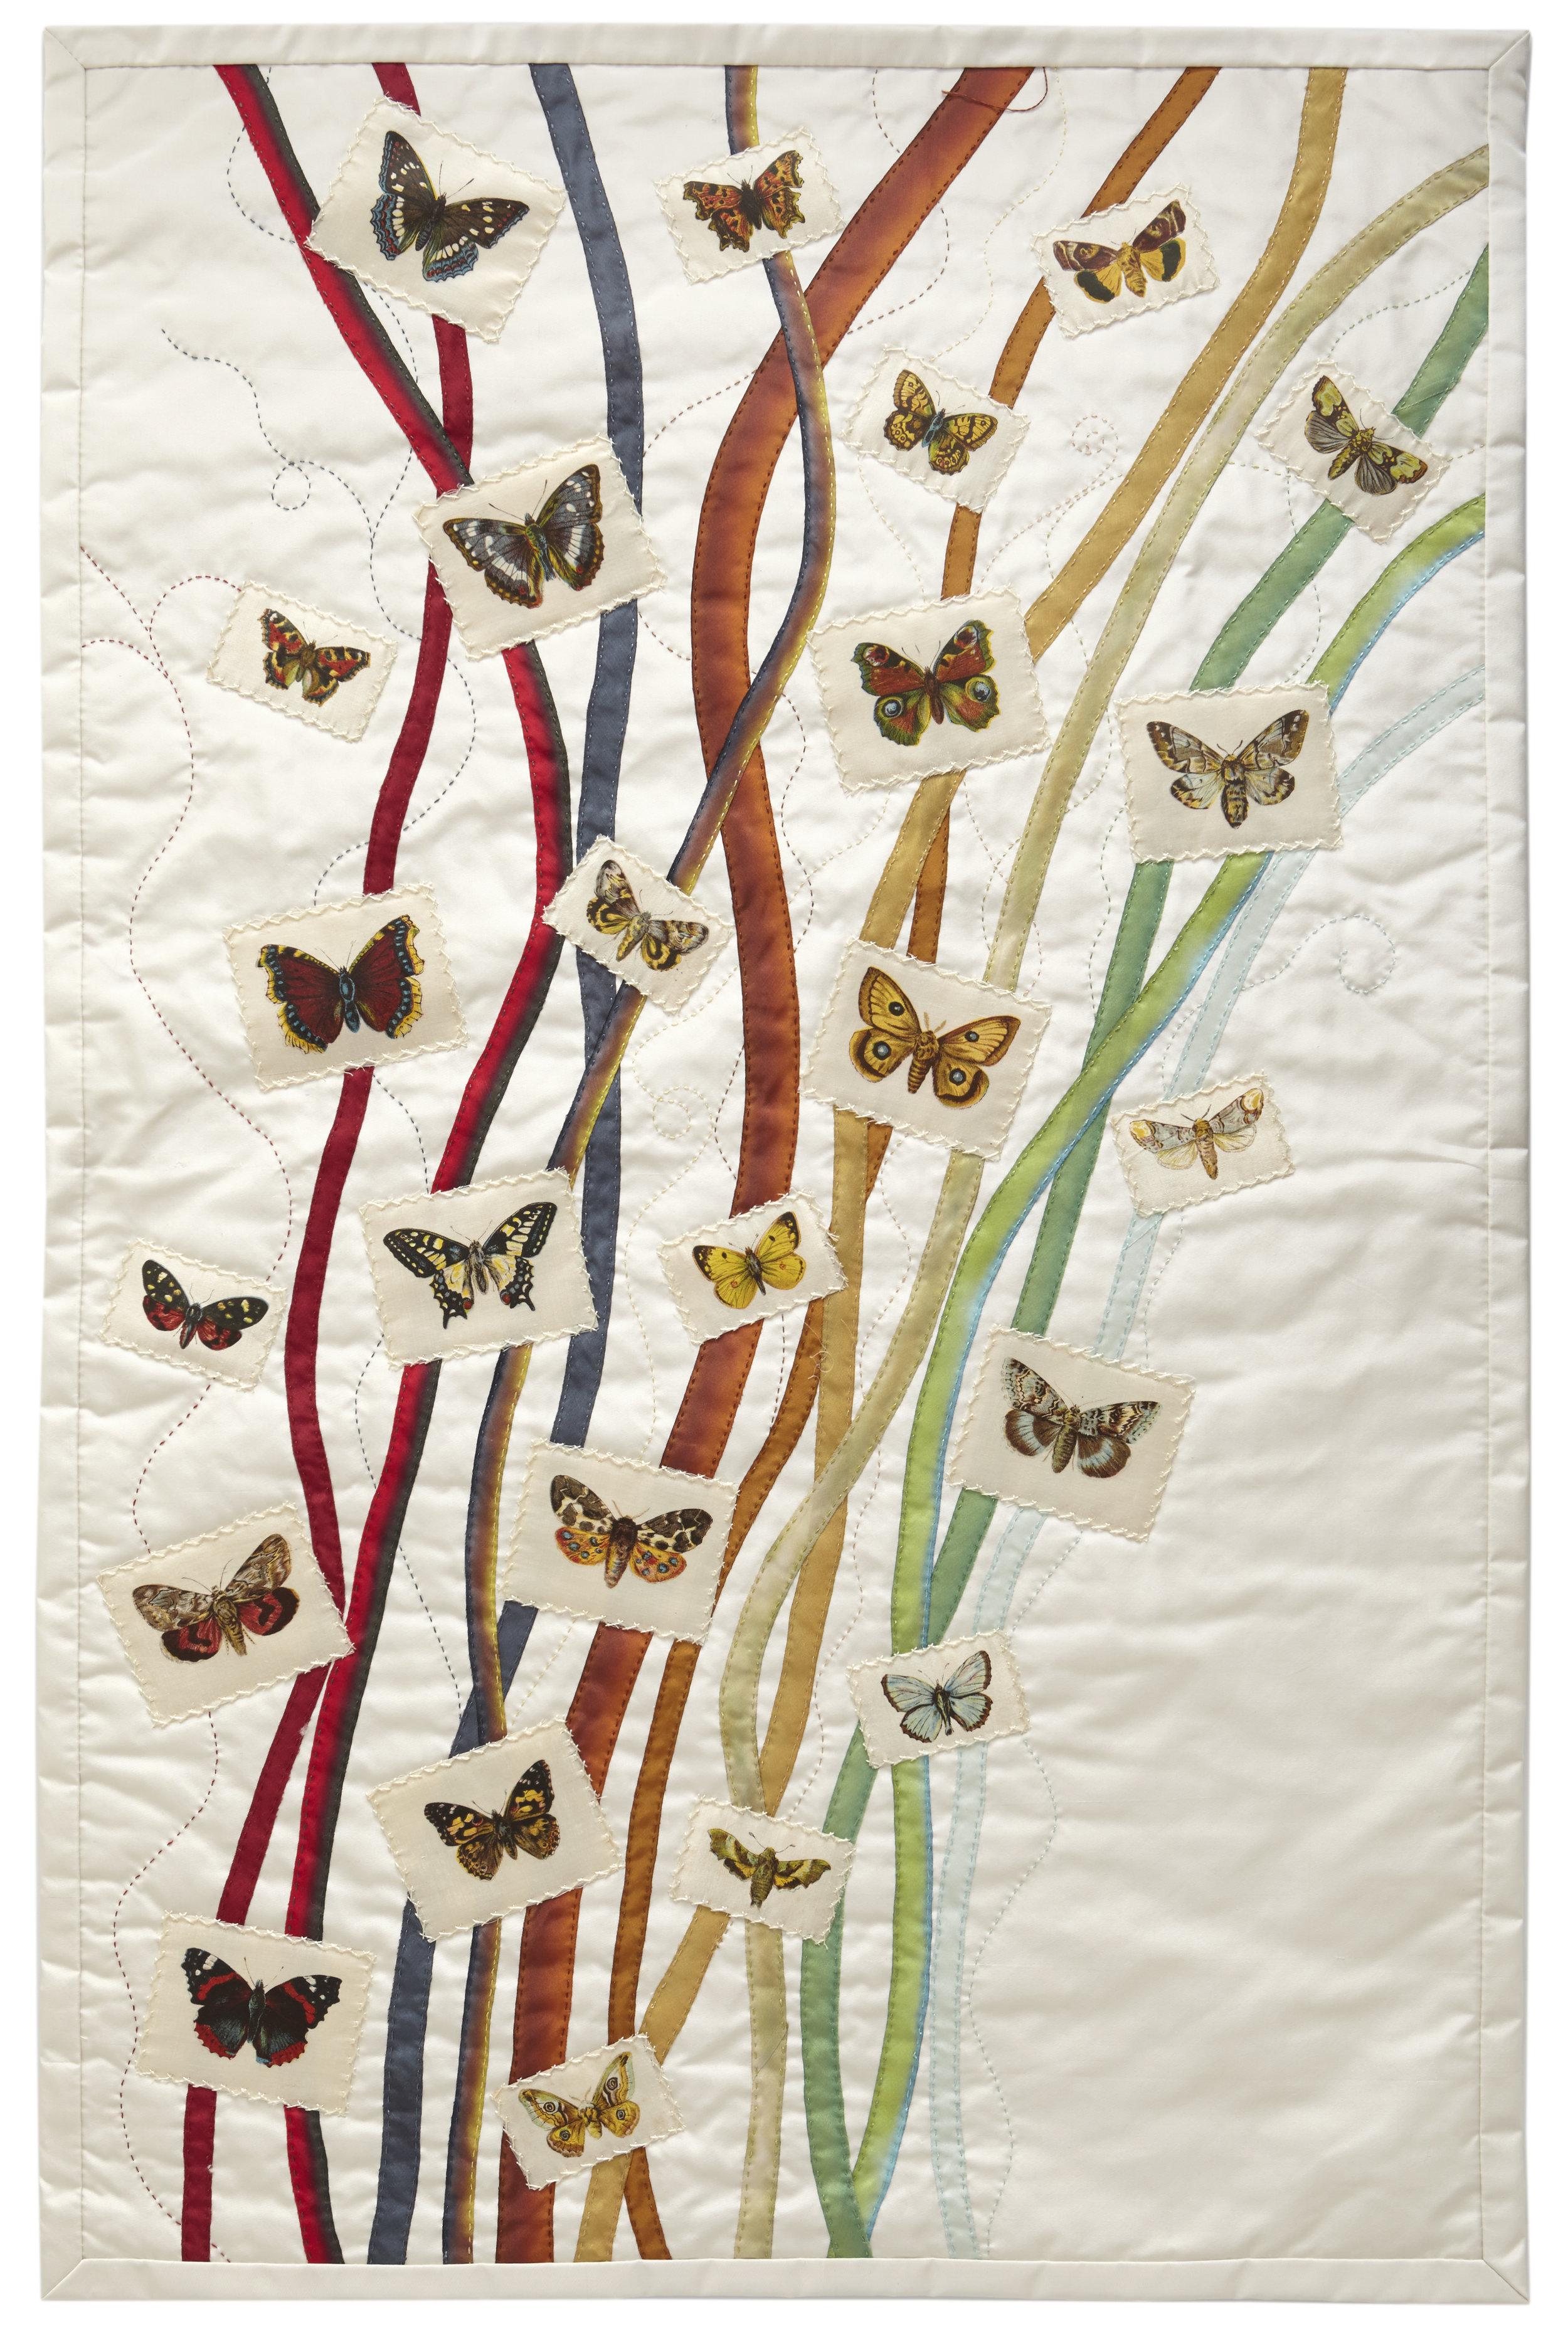 Greta Mikkelsen, Butterflies and Moths, 2015; LEA Tobacco Company silks, 1911–22; silk taffeta, hand-dyed silk ribbon; 30 x 22 in.